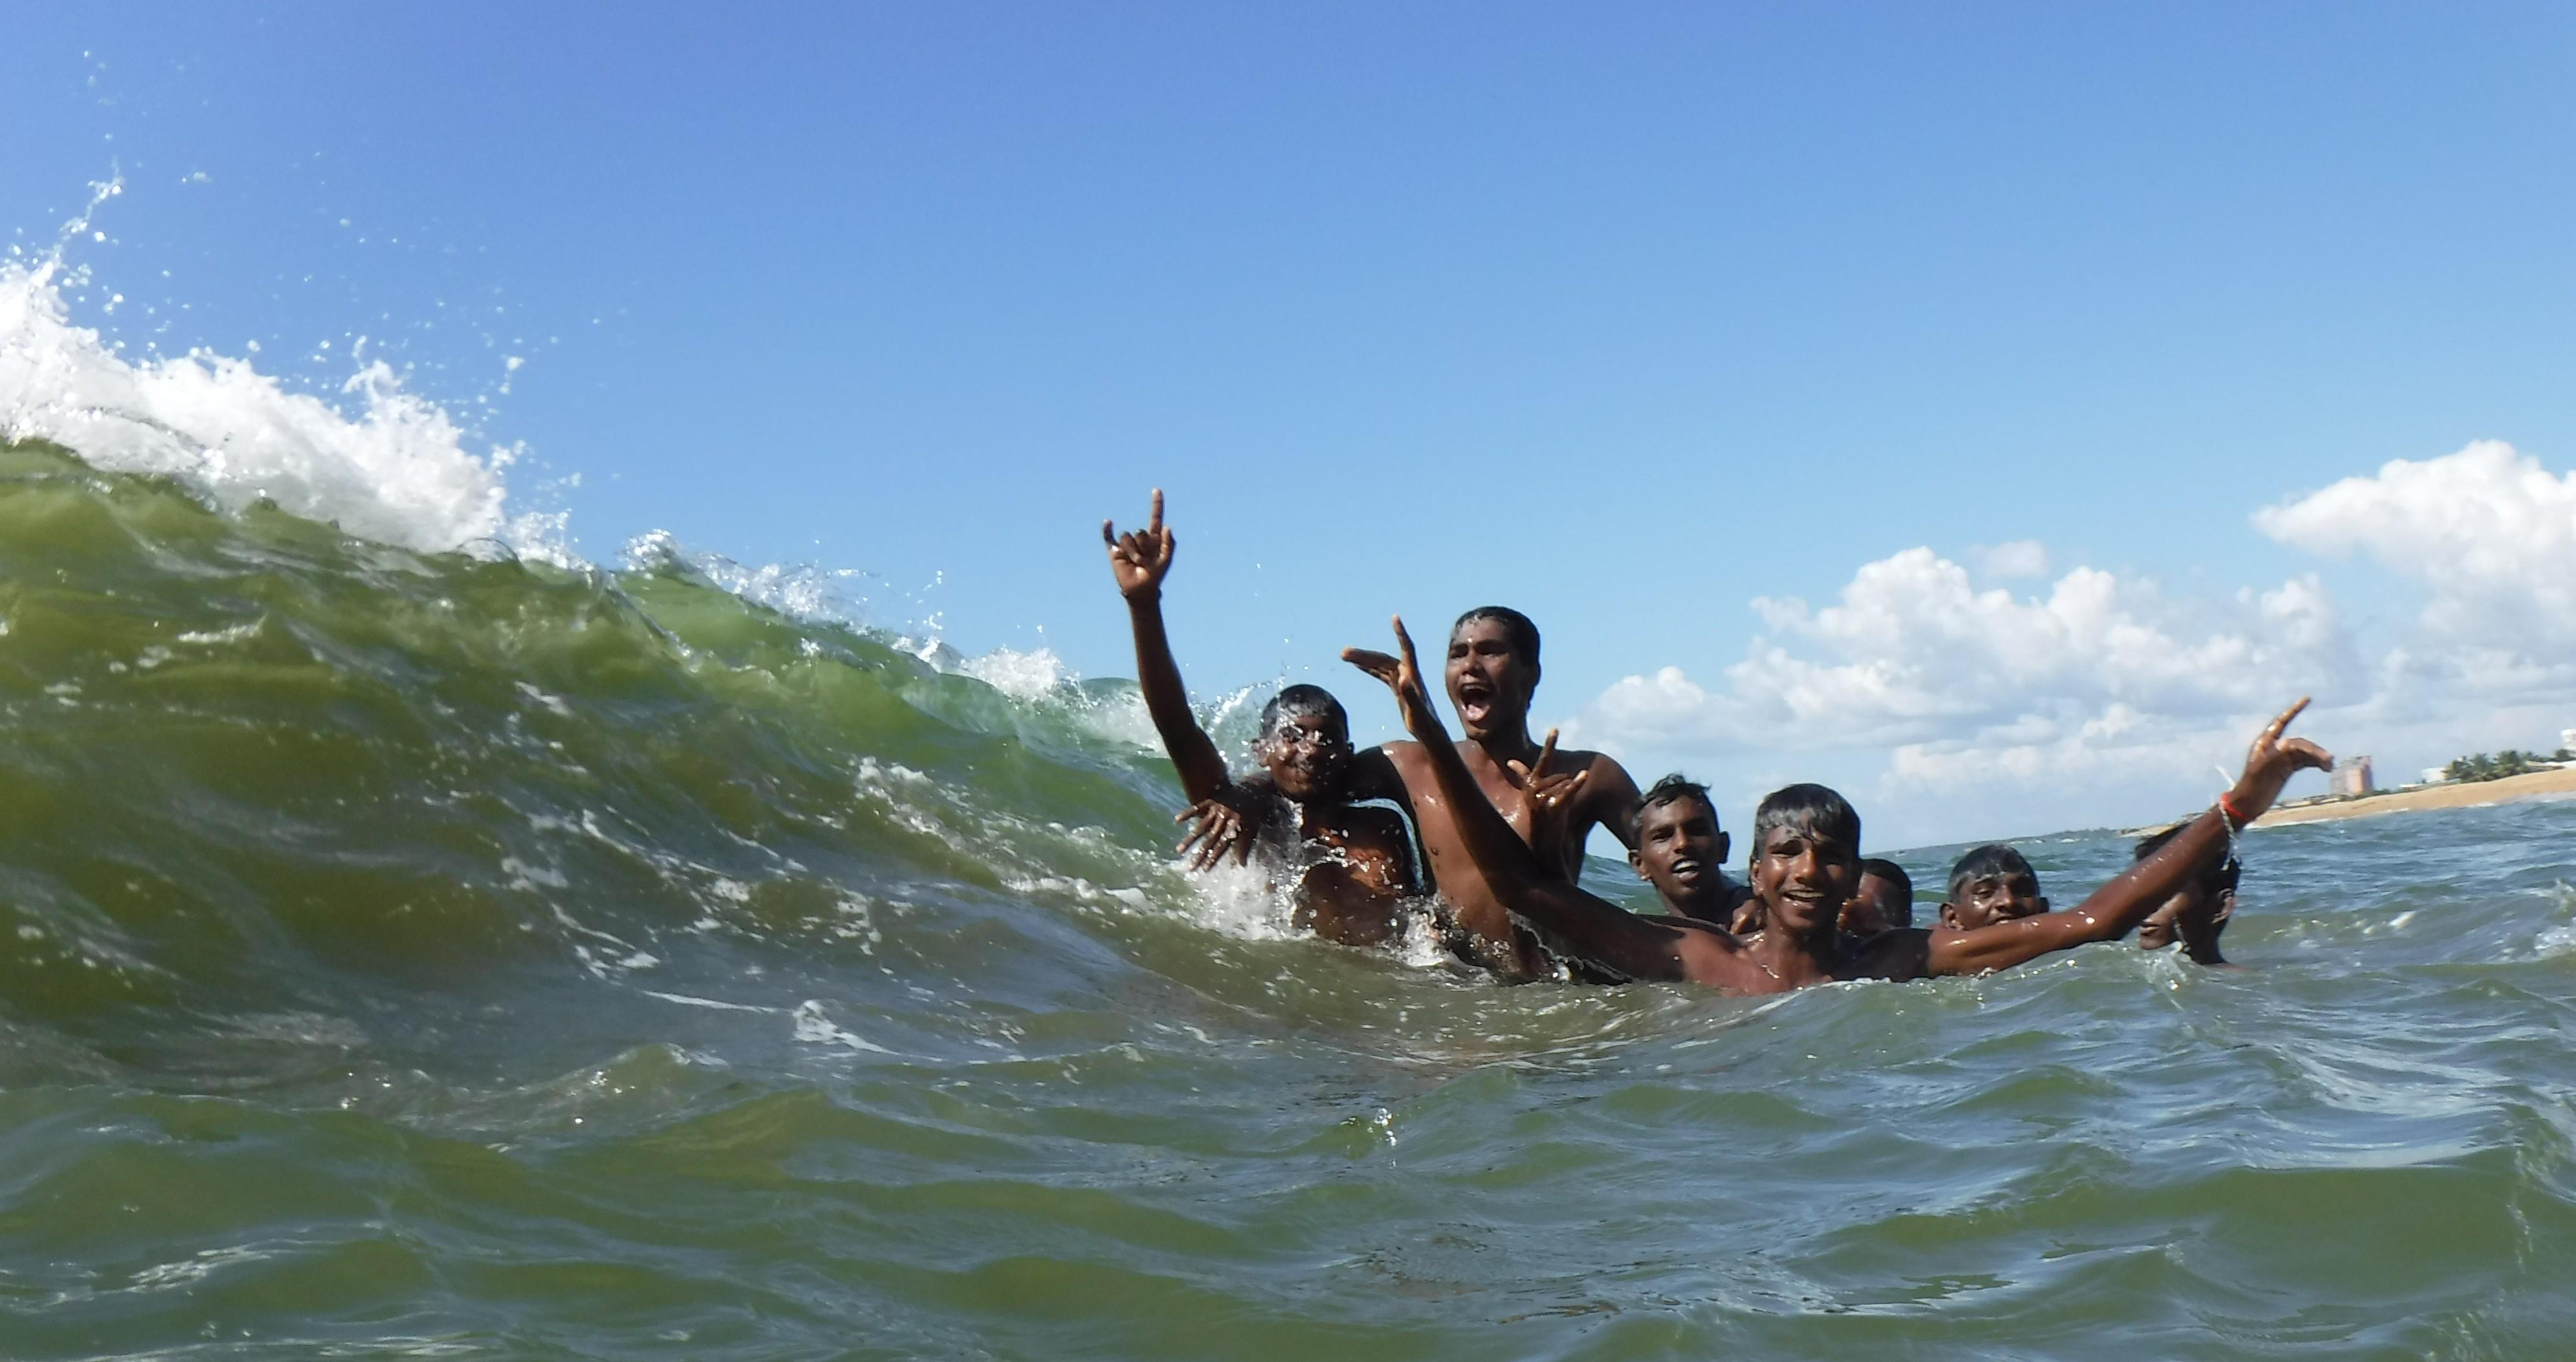 Local bathers